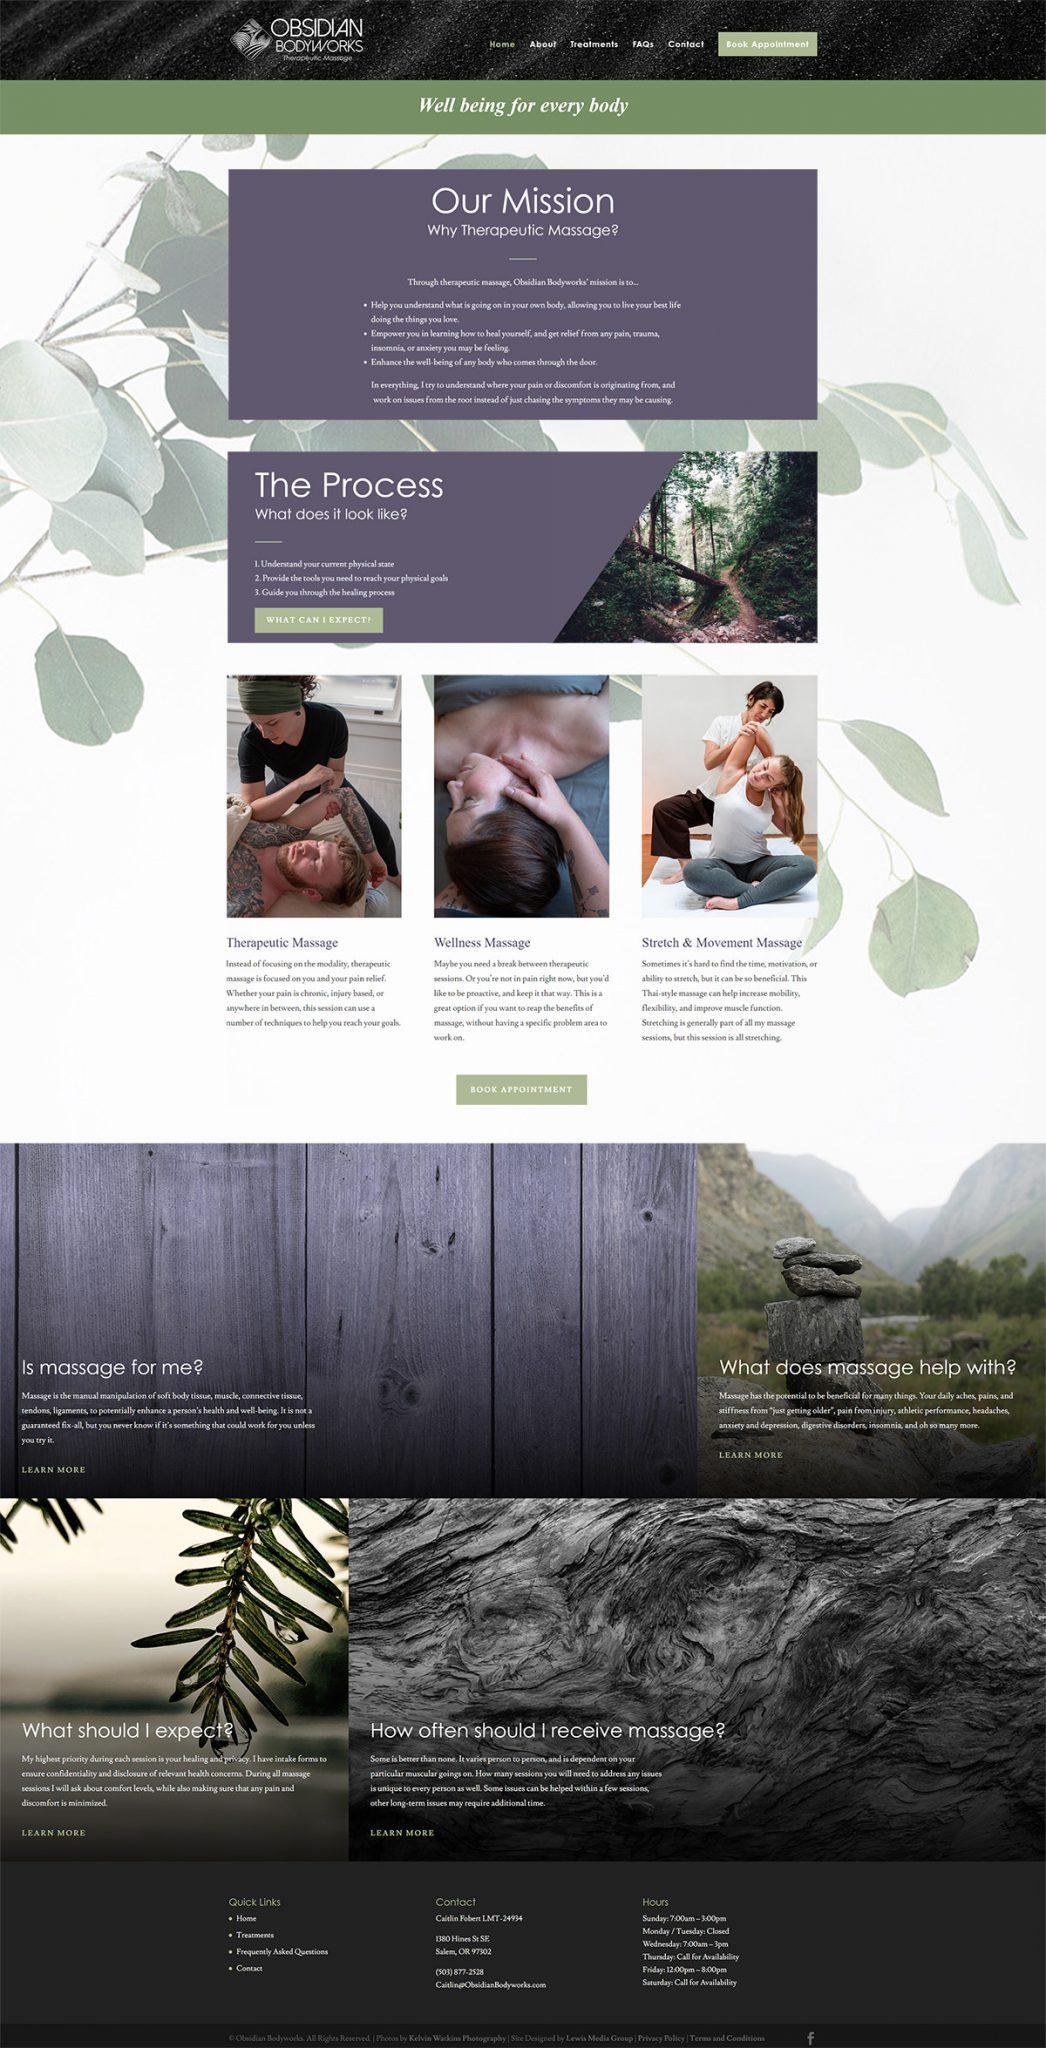 screenshot of Obsidian Bodyworks homepage